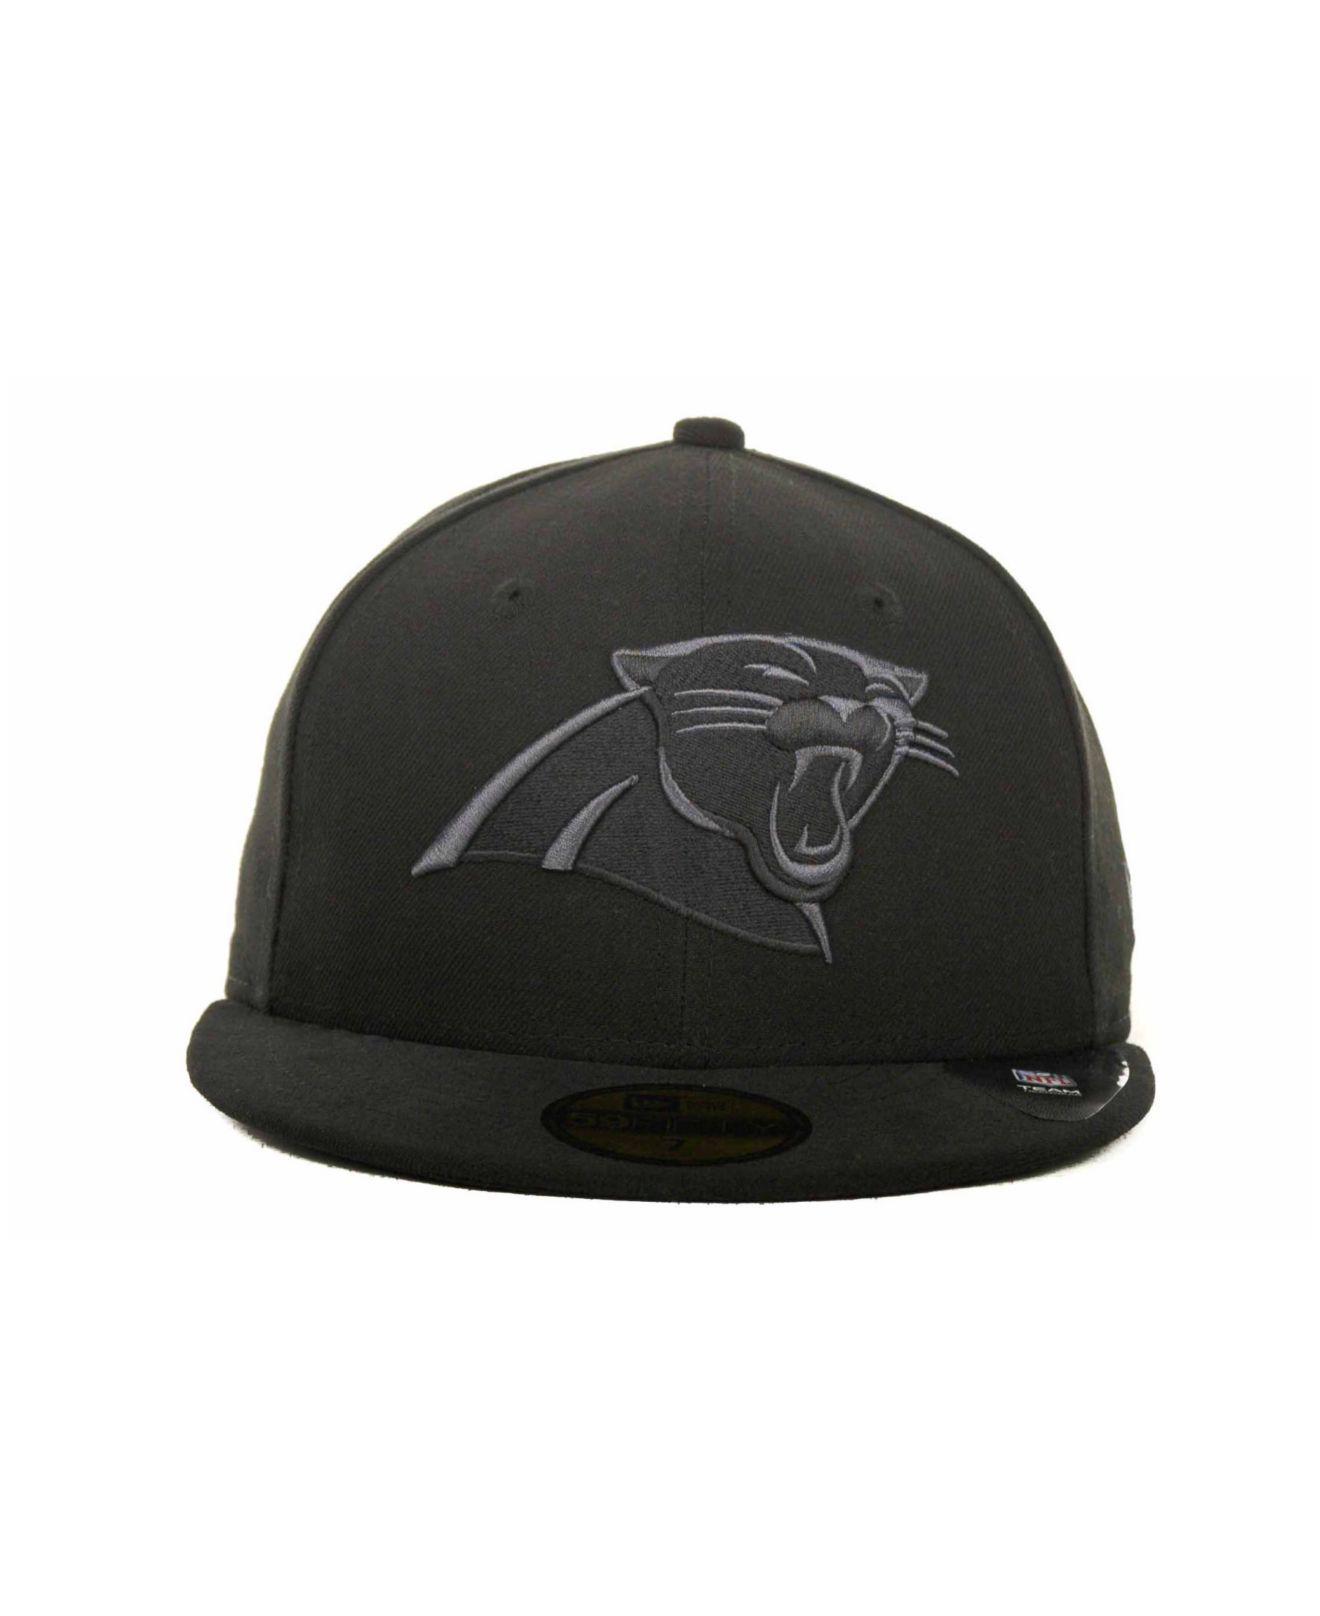 799529cbb1c Lyst - KTZ Carolina Panthers Black Gray 59fifty Hat in Black for Men